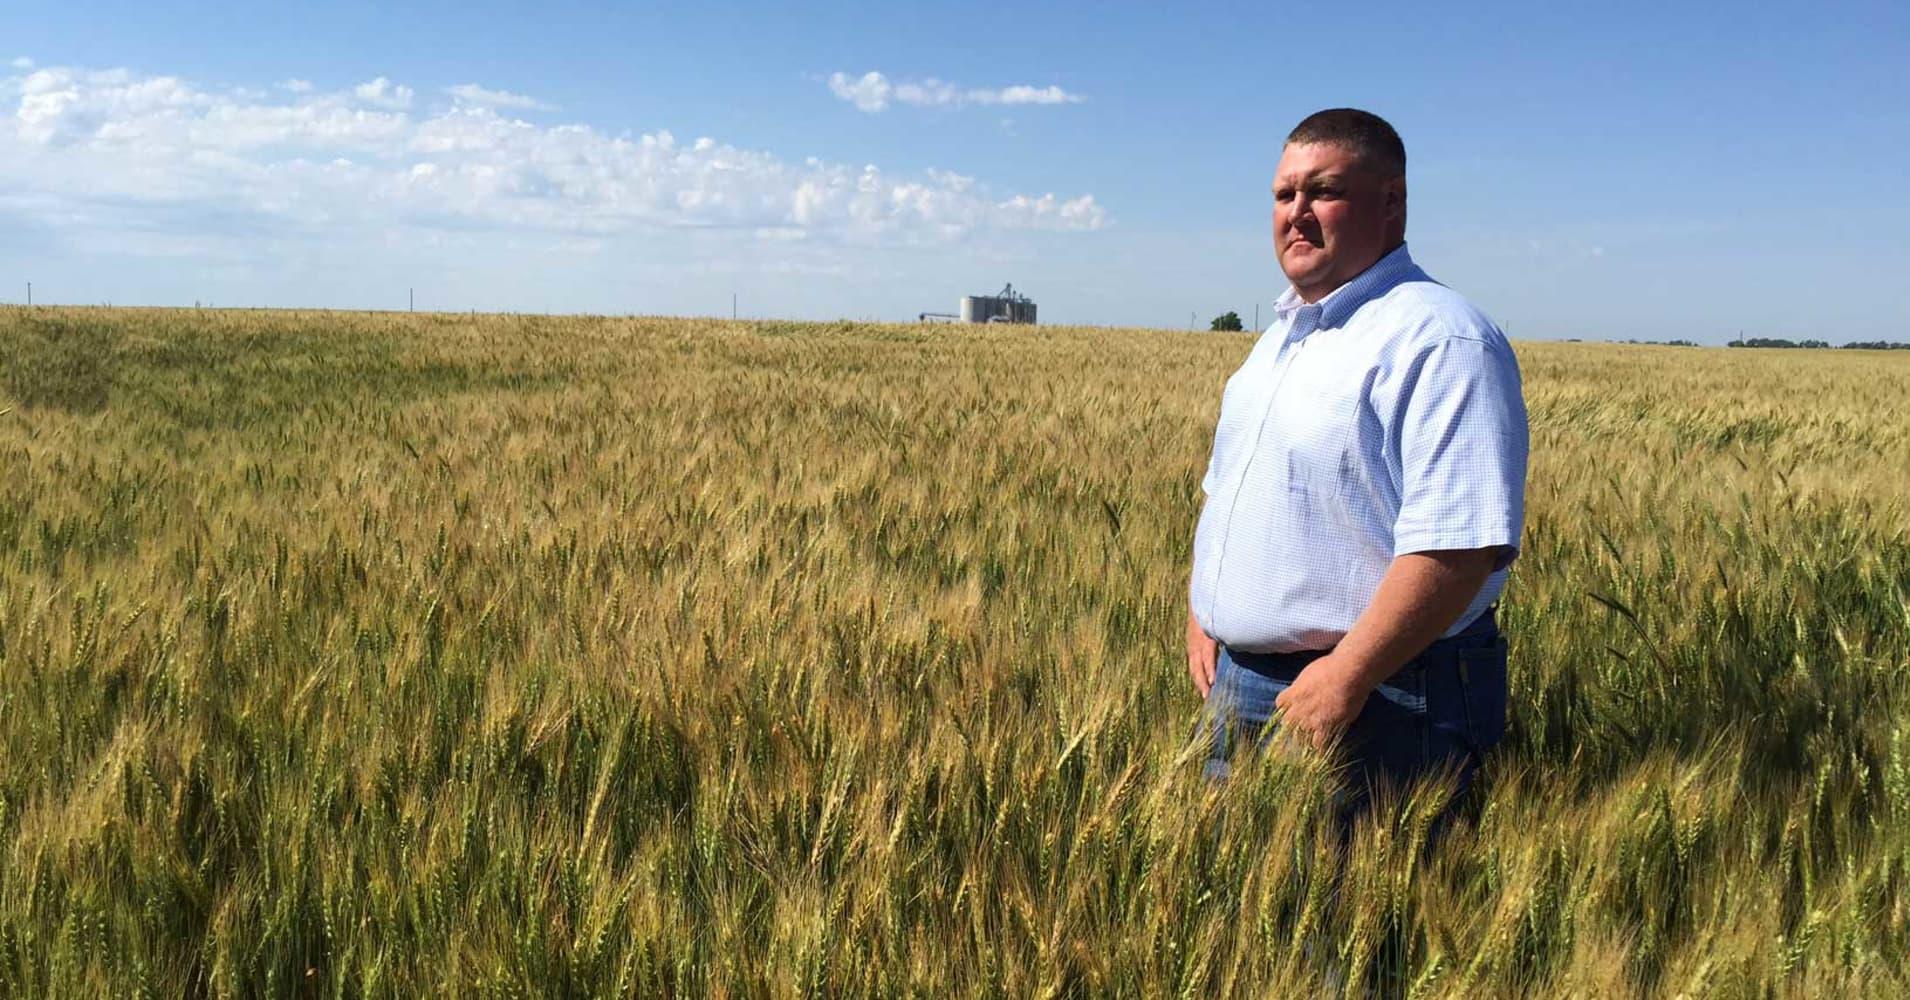 farm subsidies  trump budget has agriculture industry worried